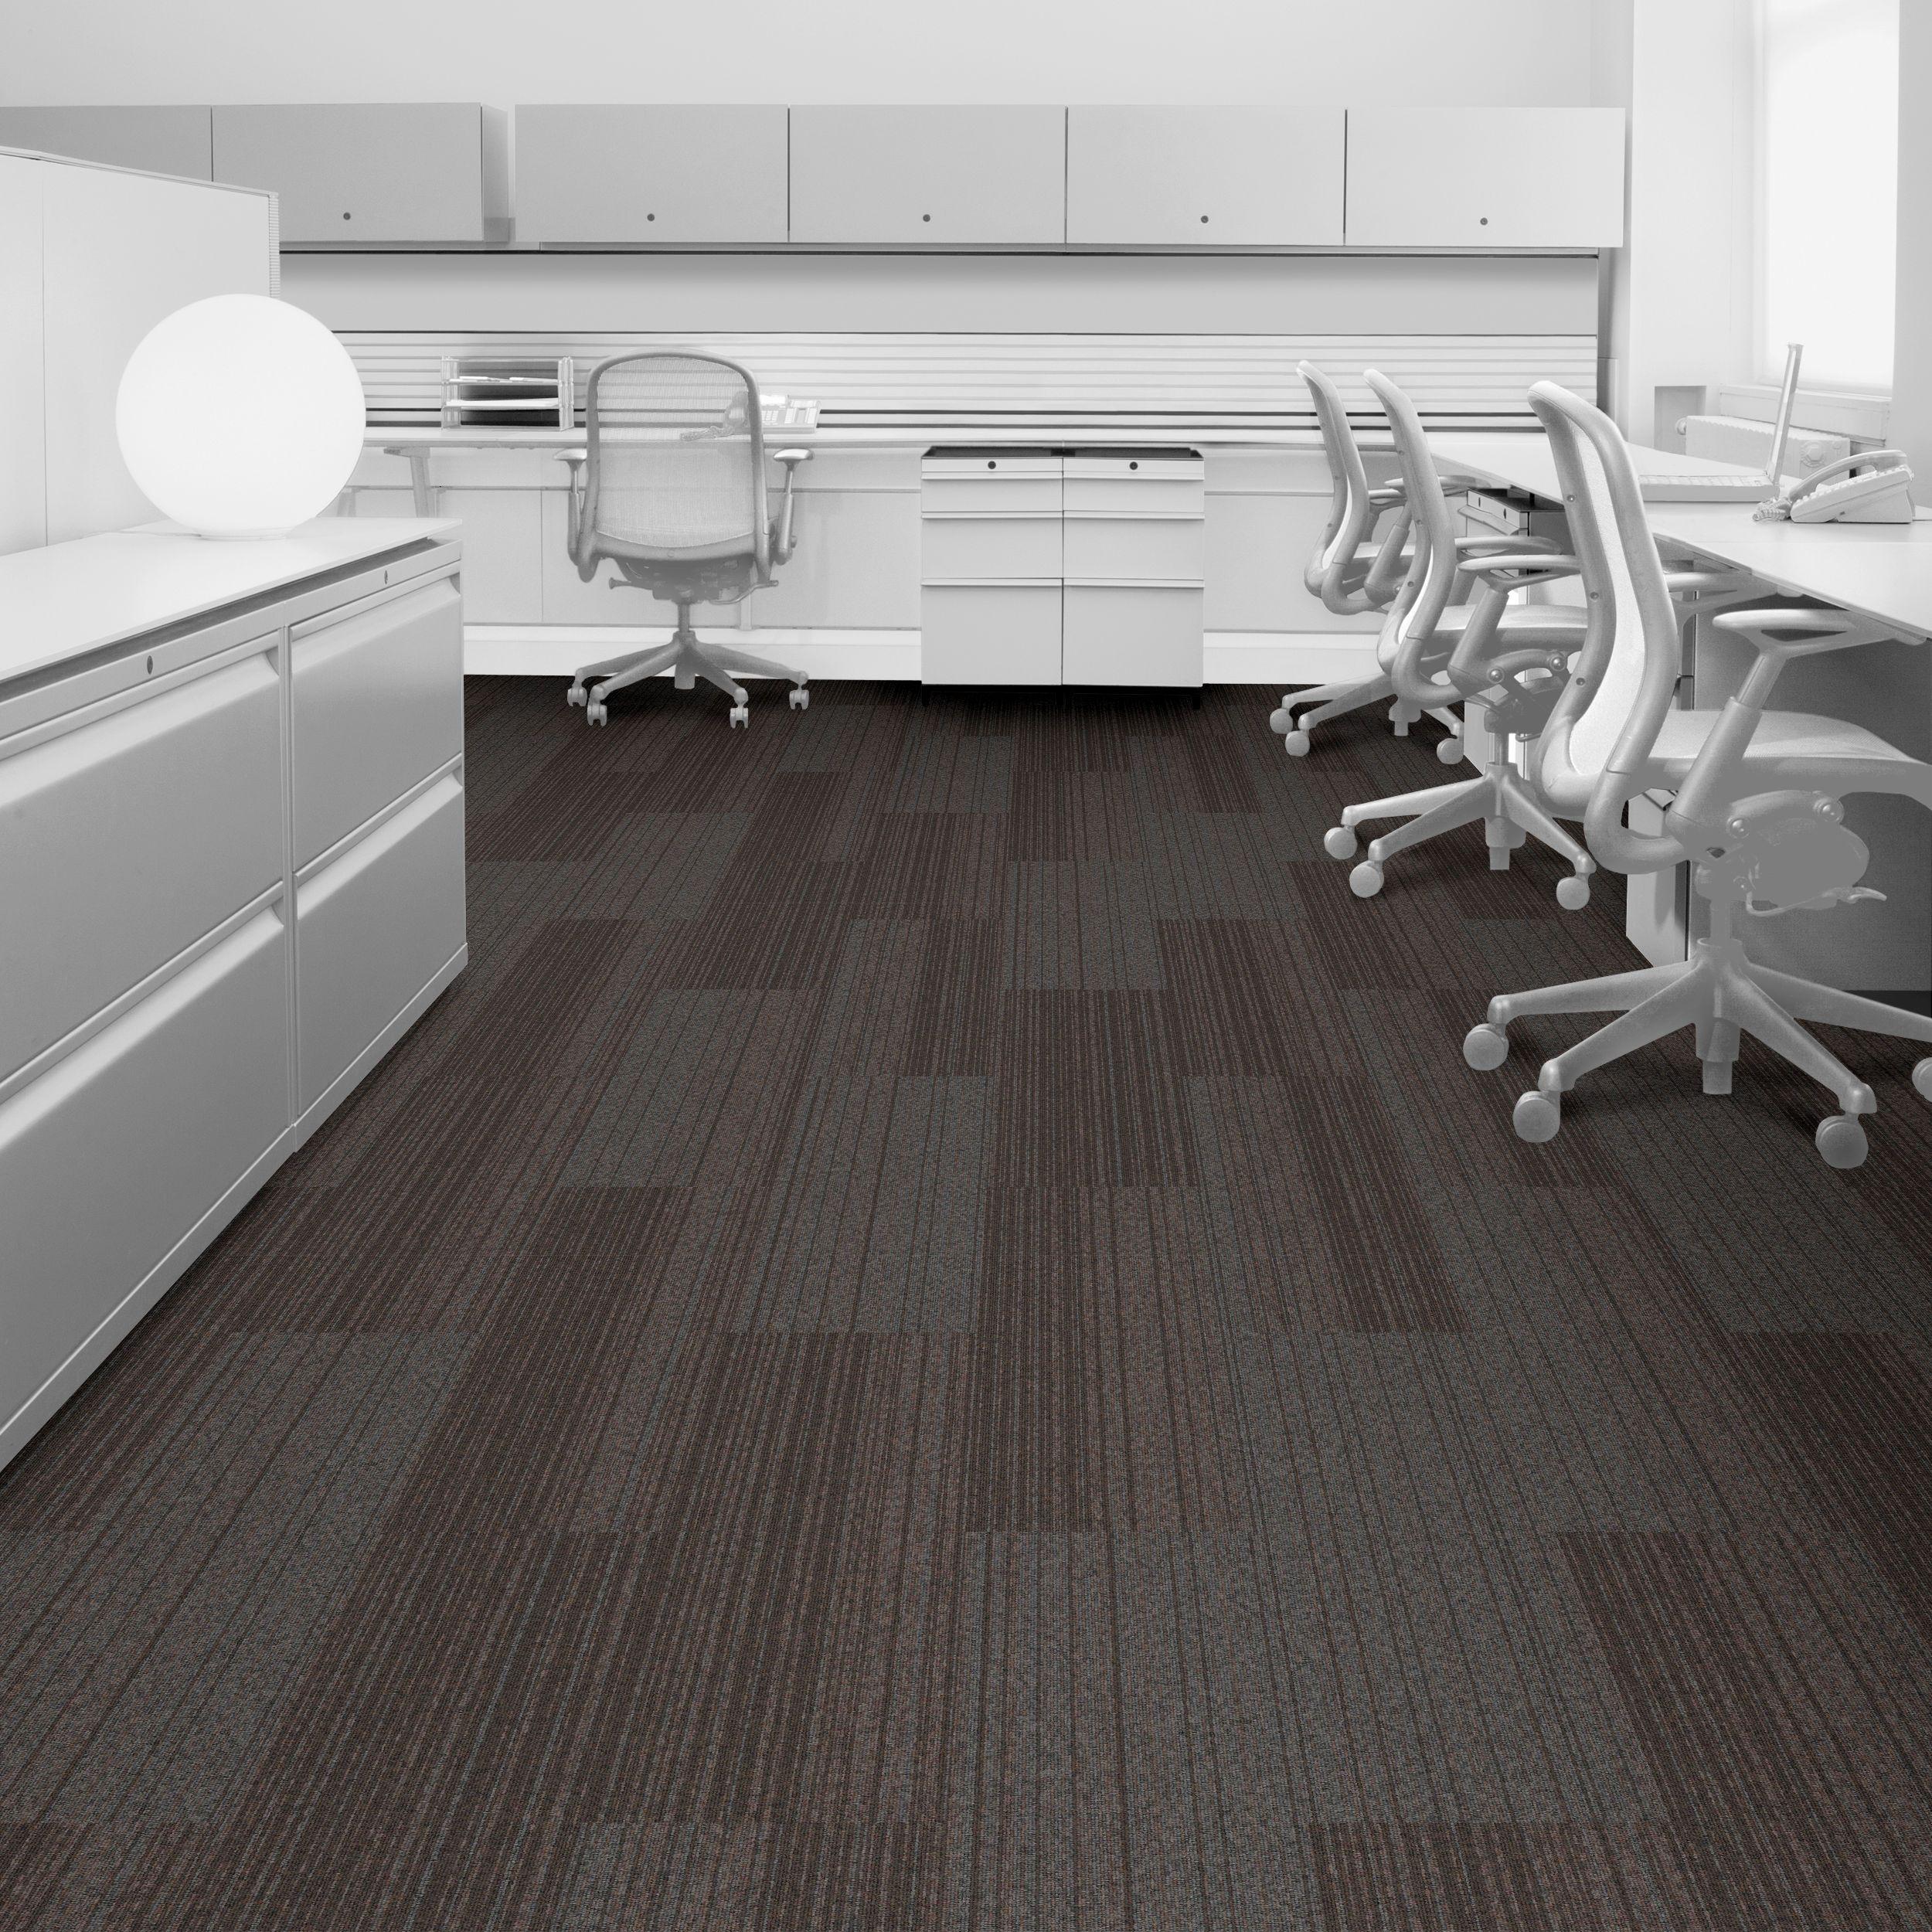 Interface carpet tile shiver me timbers color buckeye 103937 interface carpet tile shiver me timbers color buckeye 103937 installation method ashlar room baanklon Gallery